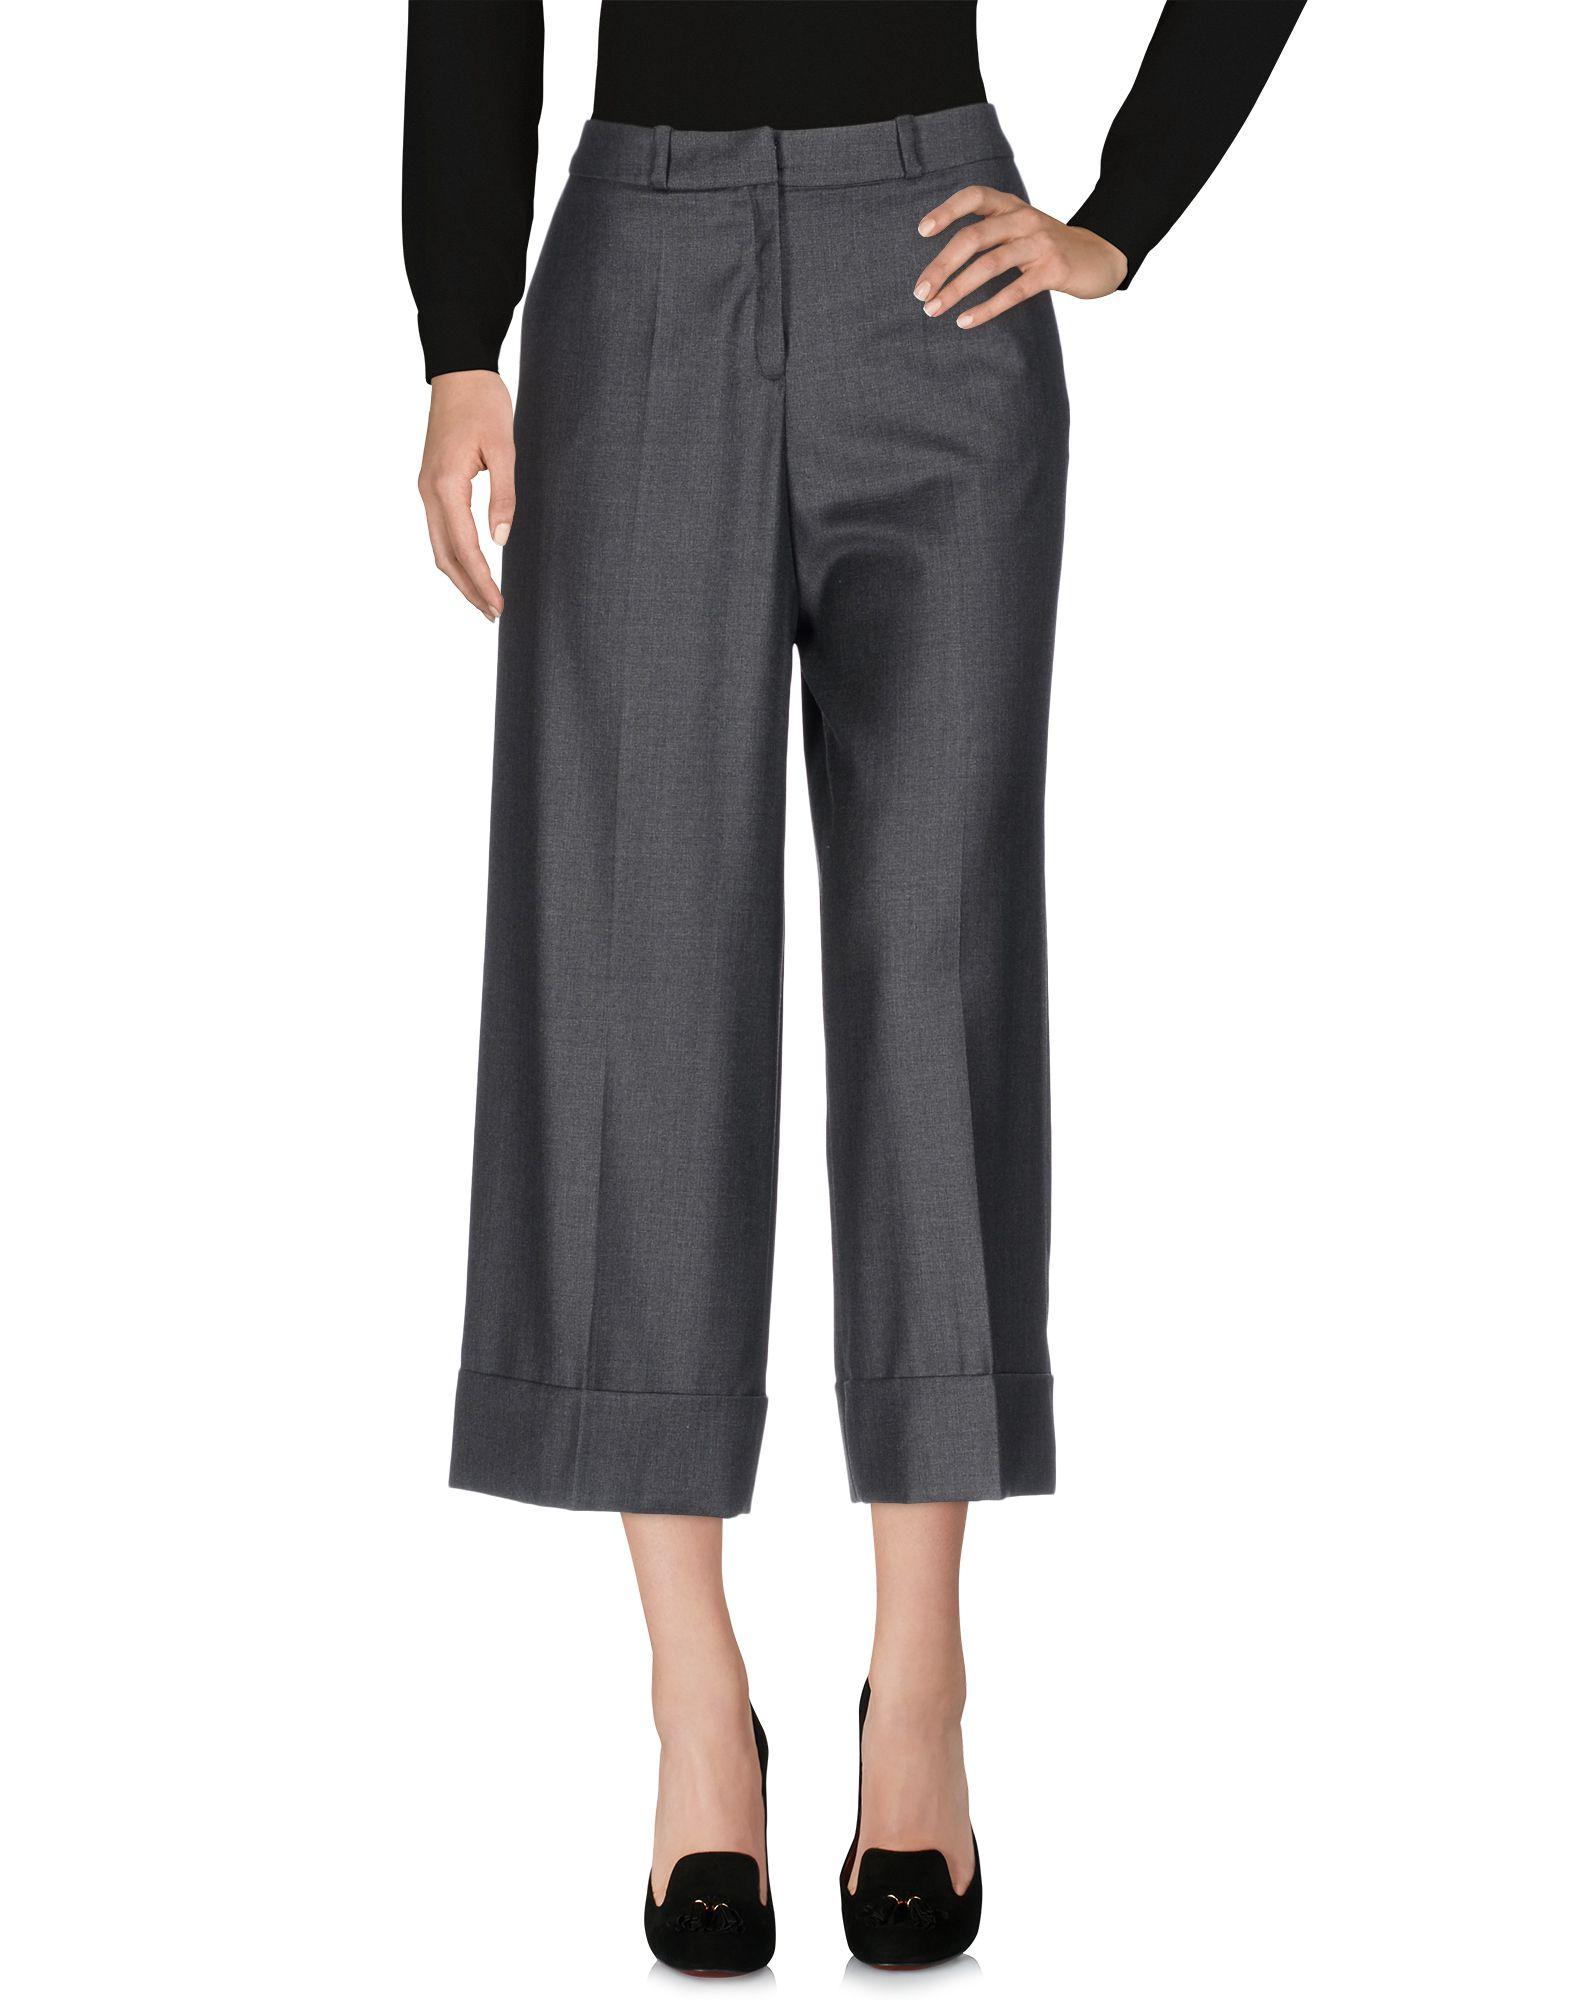 LALA BERLIN Casual Pants in Grey